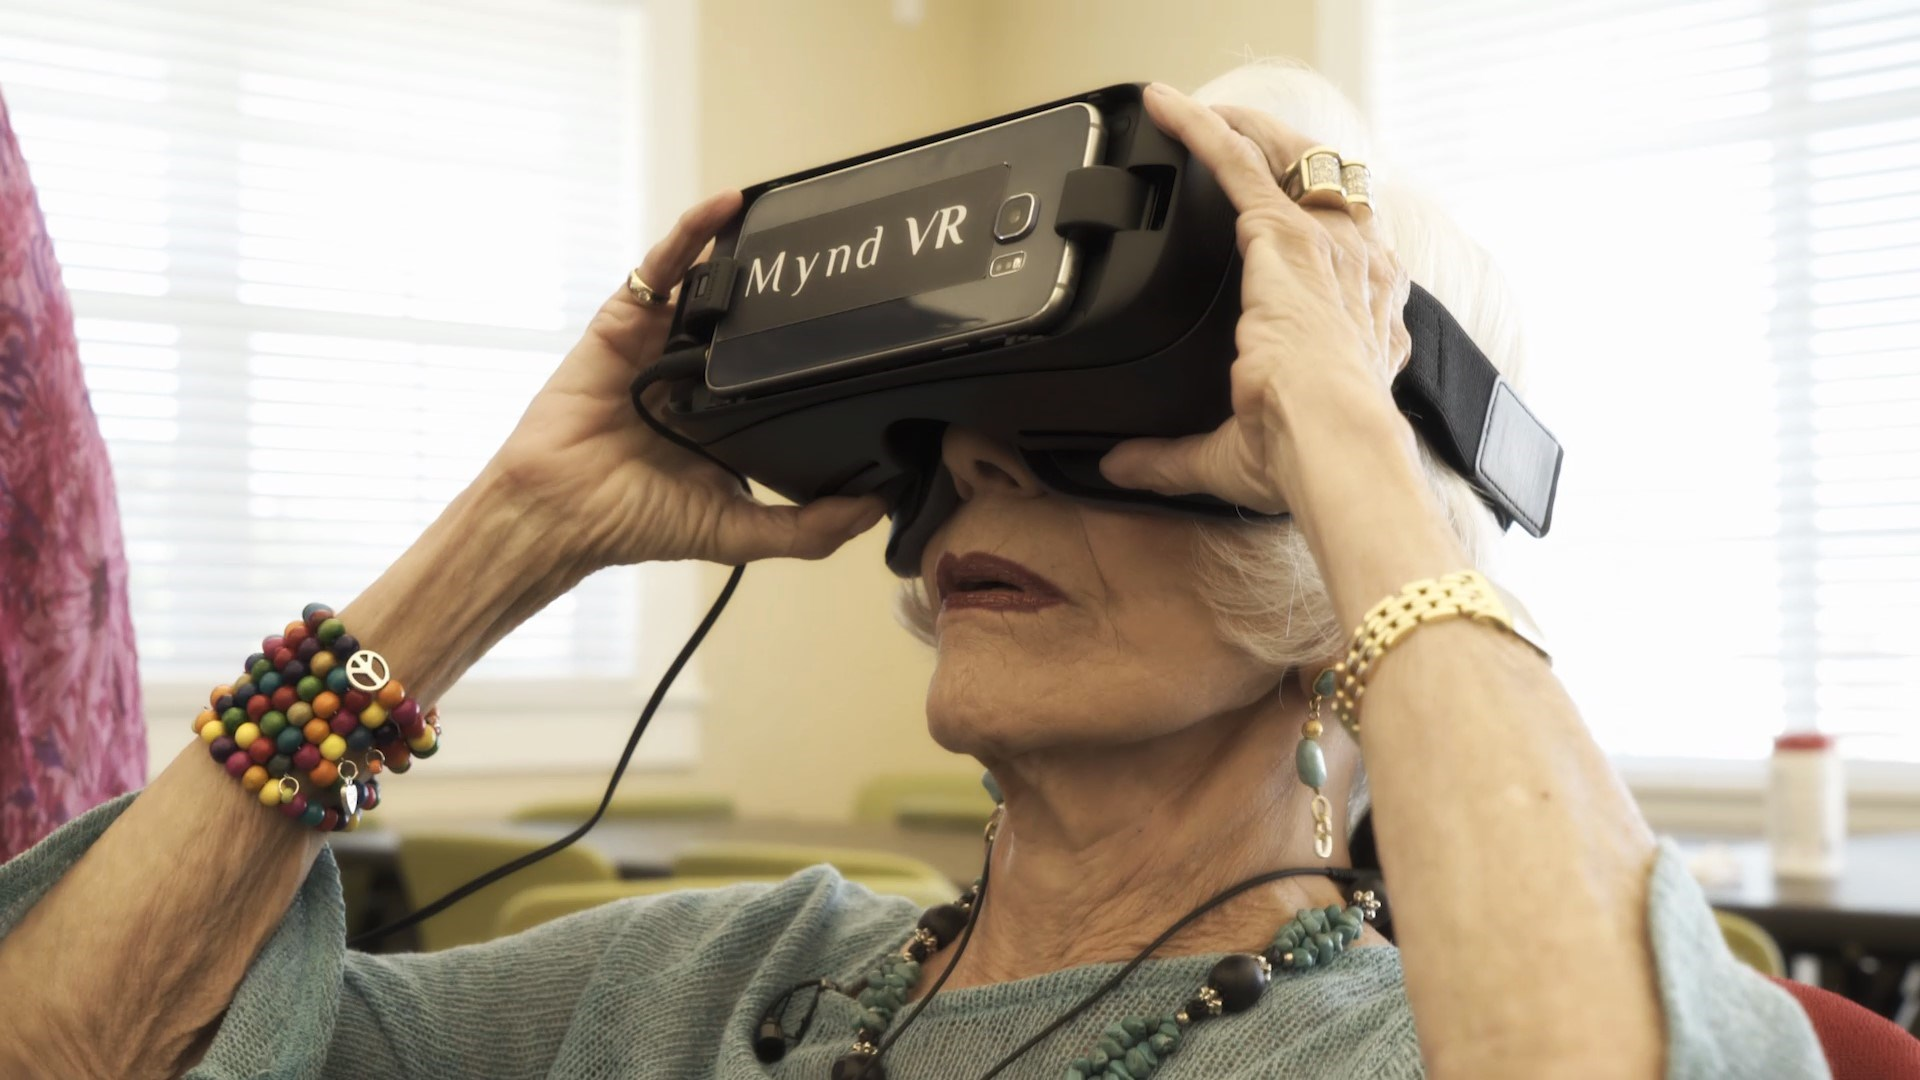 Virtual reality company announces partnership